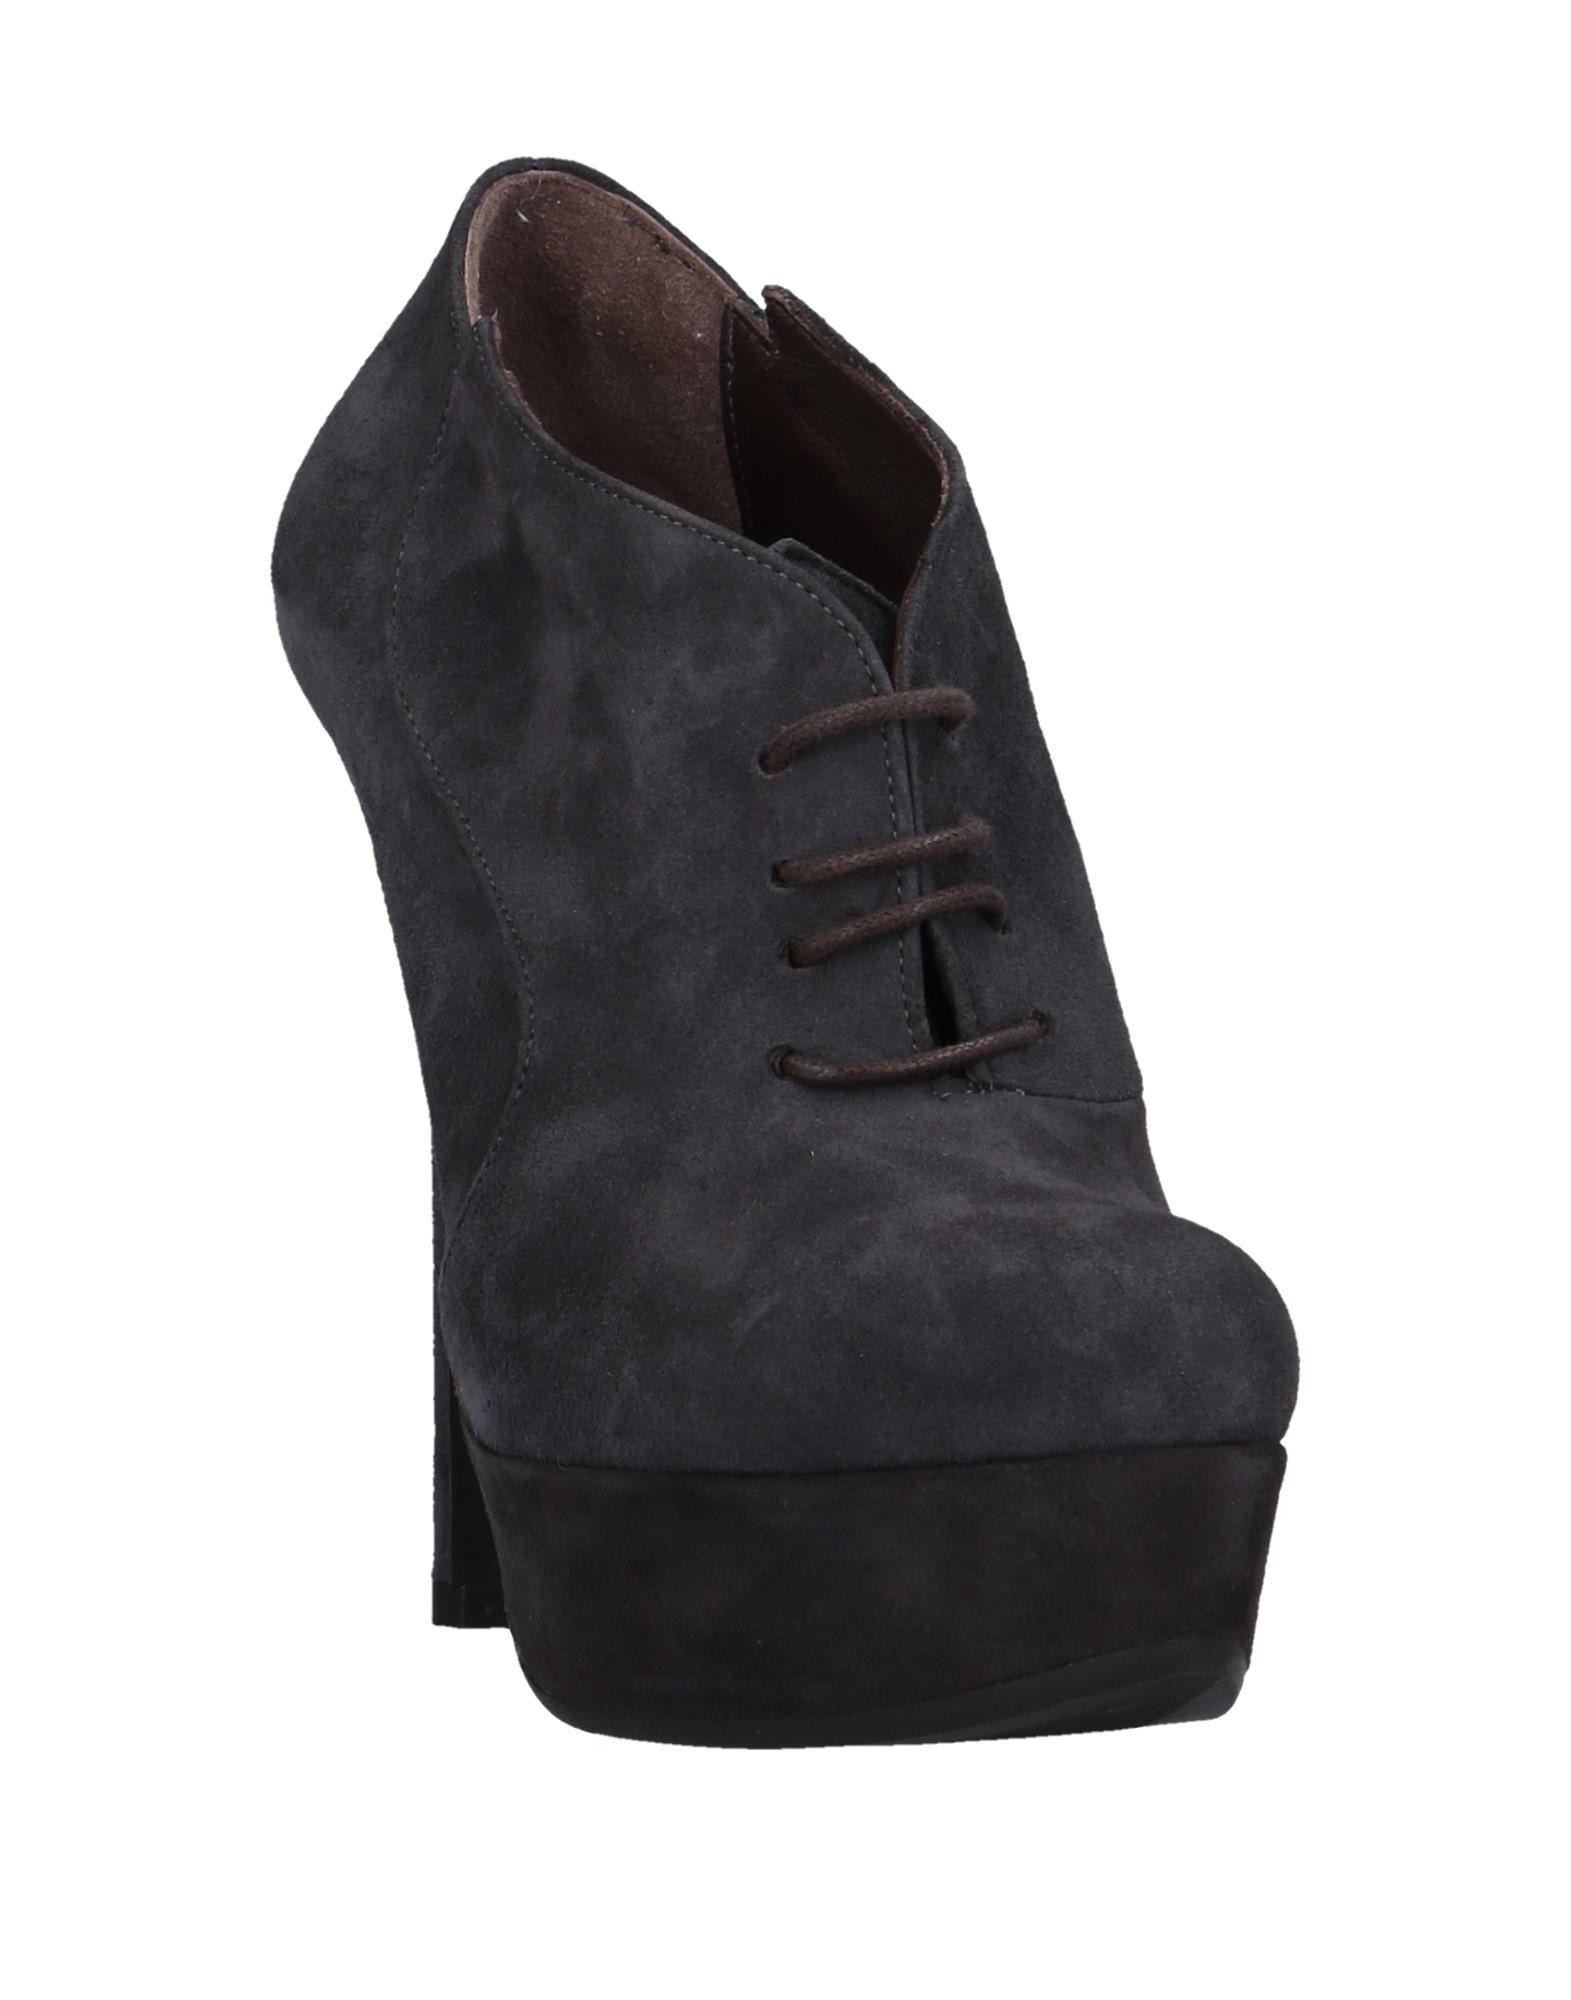 Stilvolle billige Schnürschuhe Schuhe Giancarlo Paoli Schnürschuhe billige Damen  11525018UL 14847e